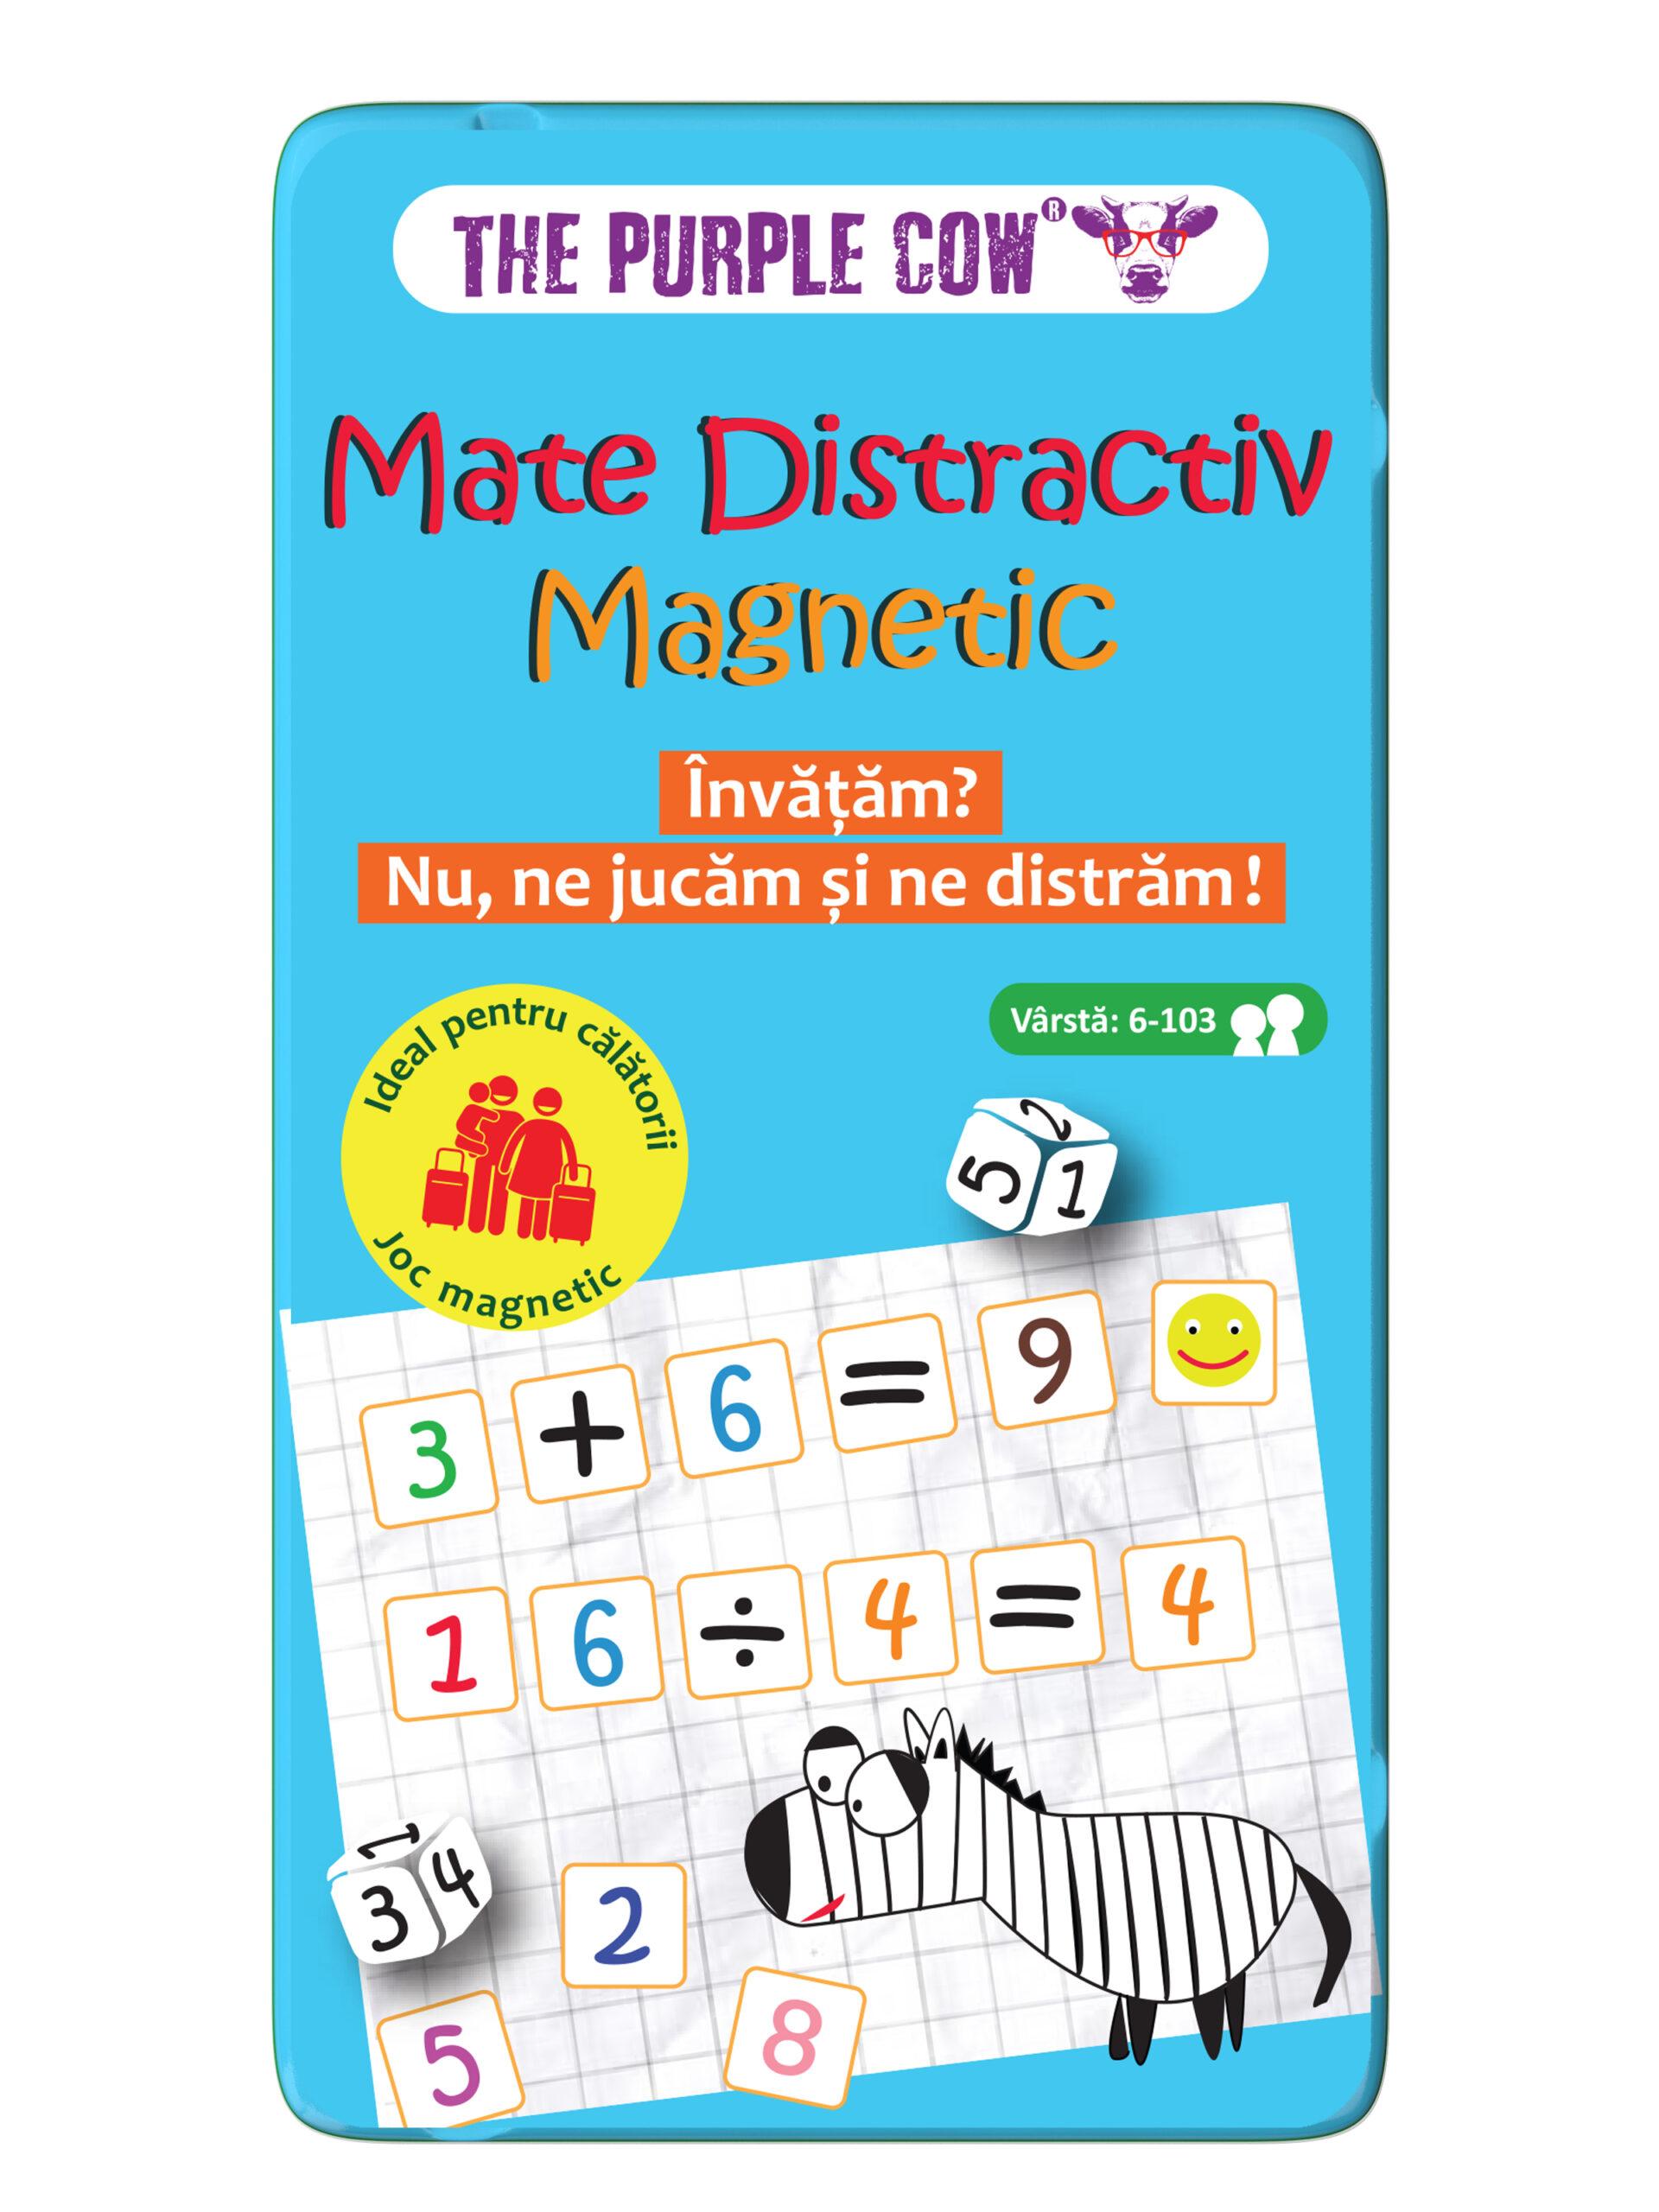 Joc - Mate distractiv magnetic | The Purple Cow